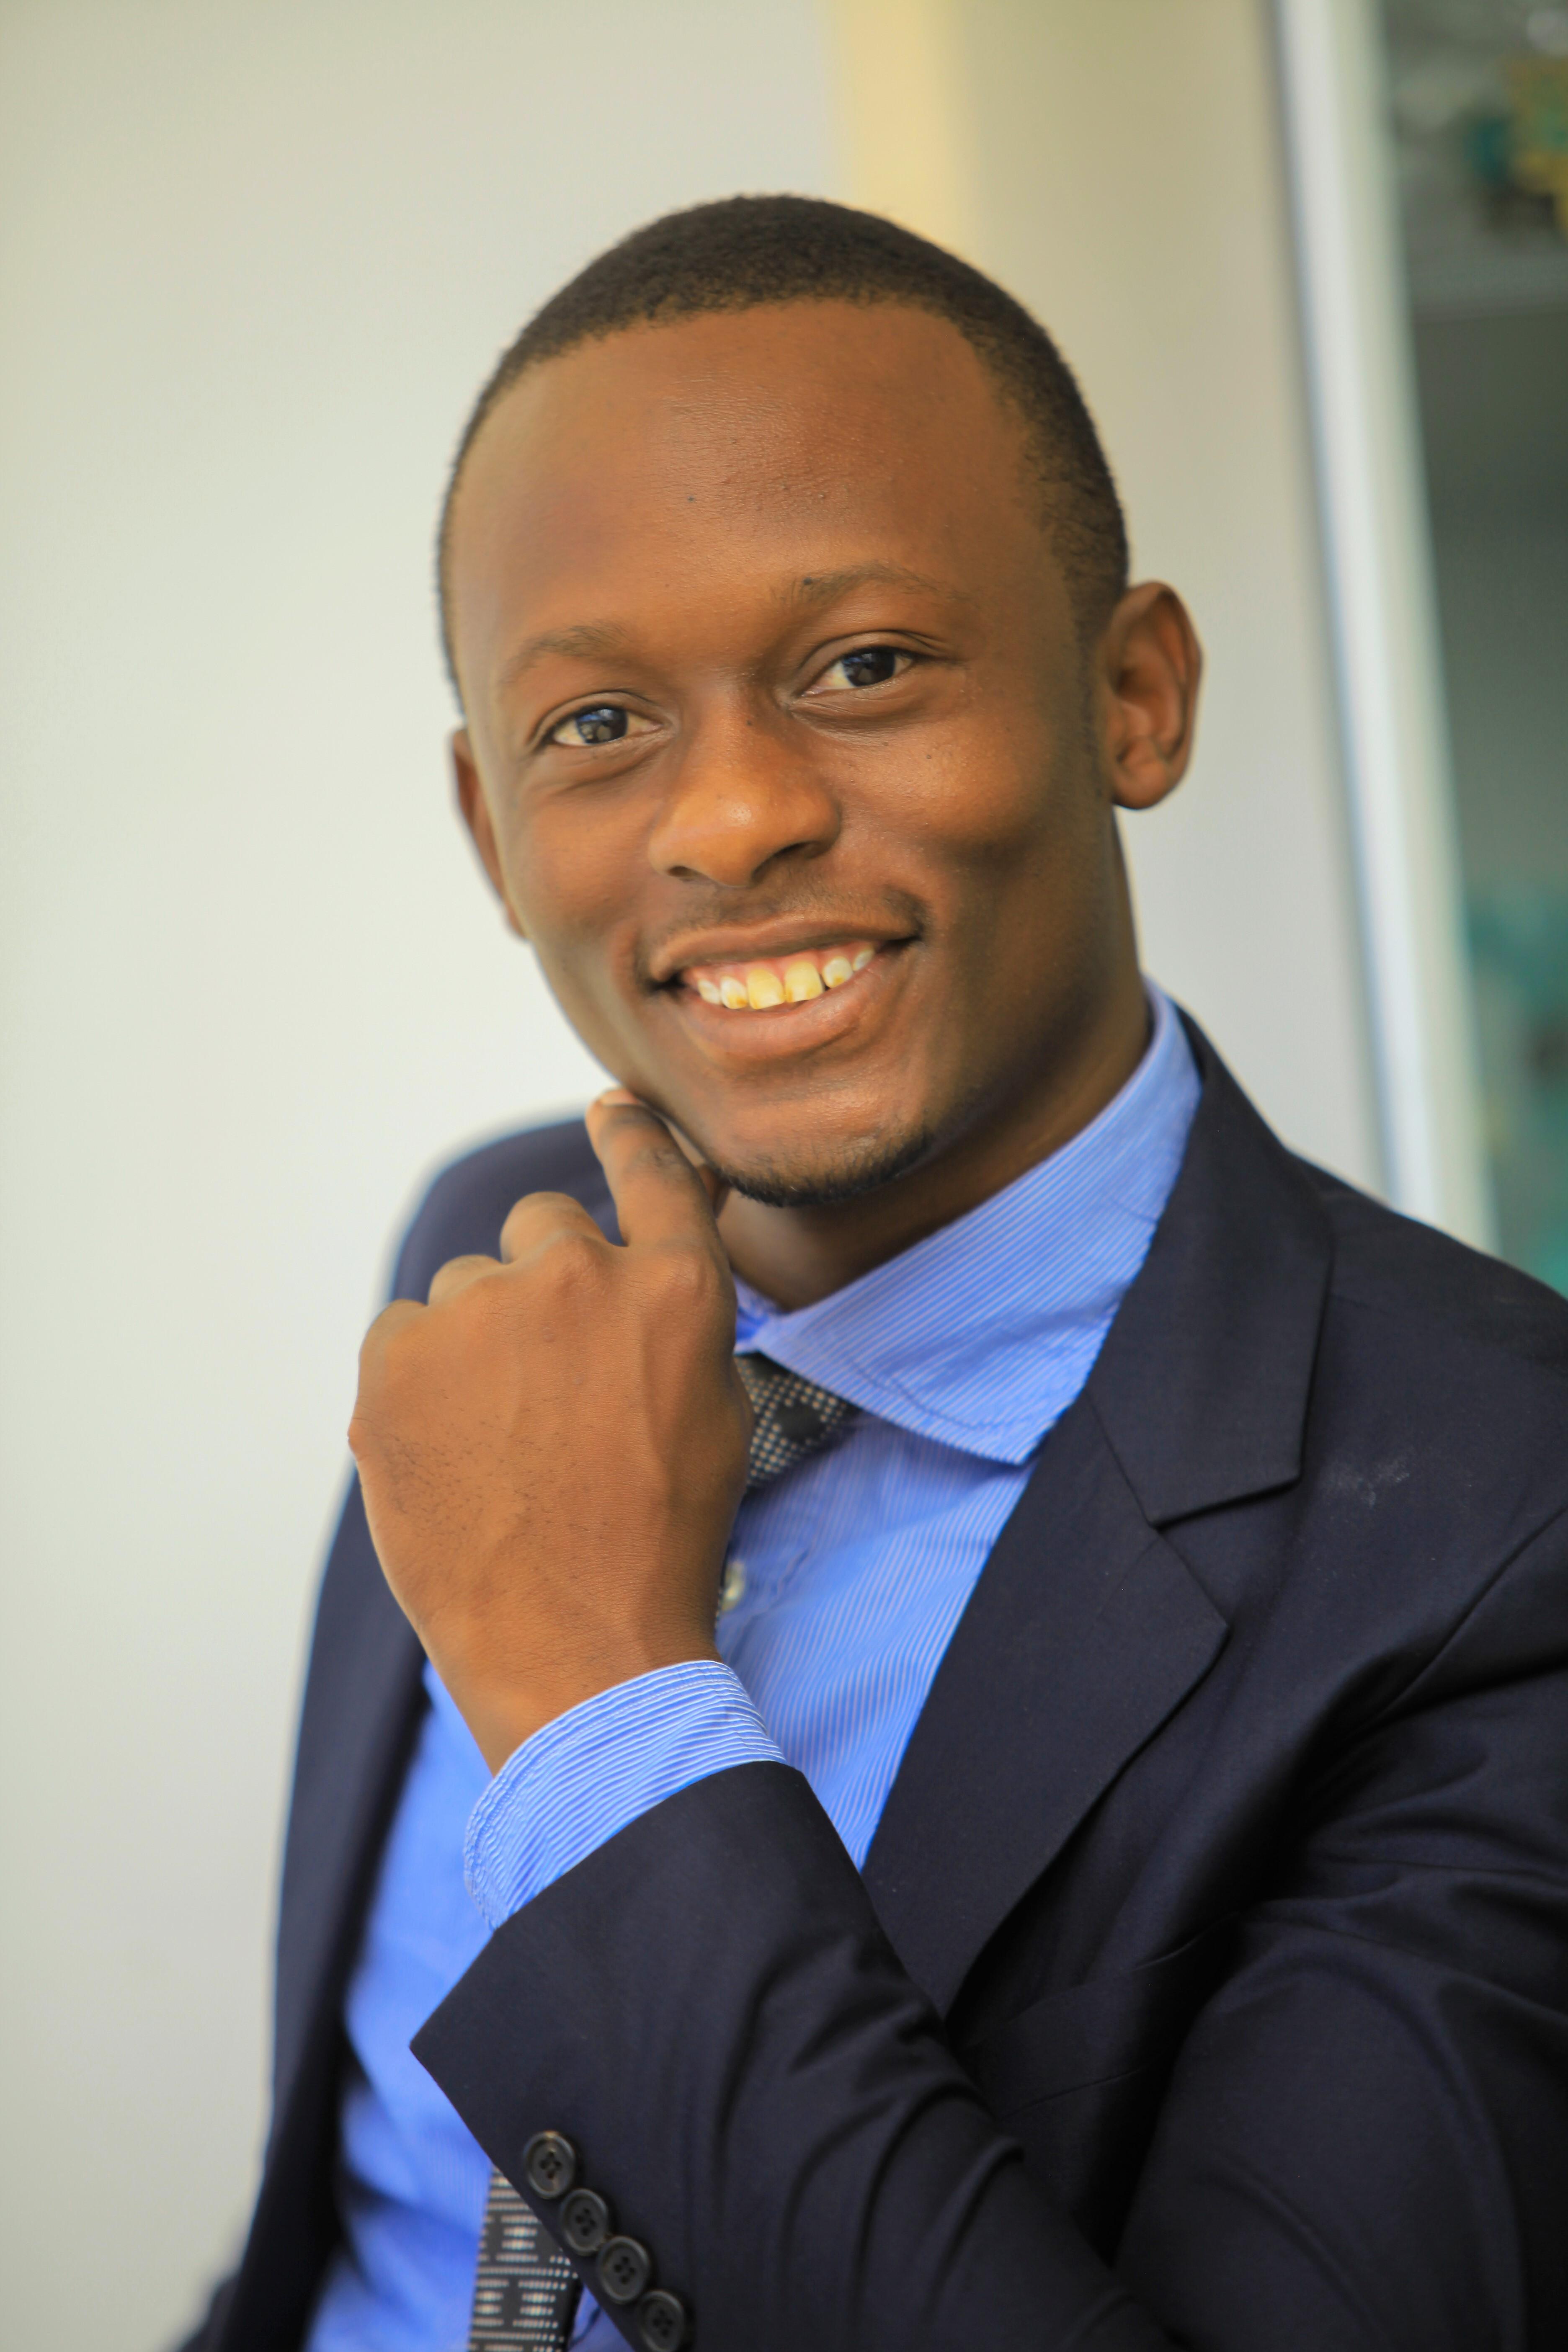 Yovinius Mwendo